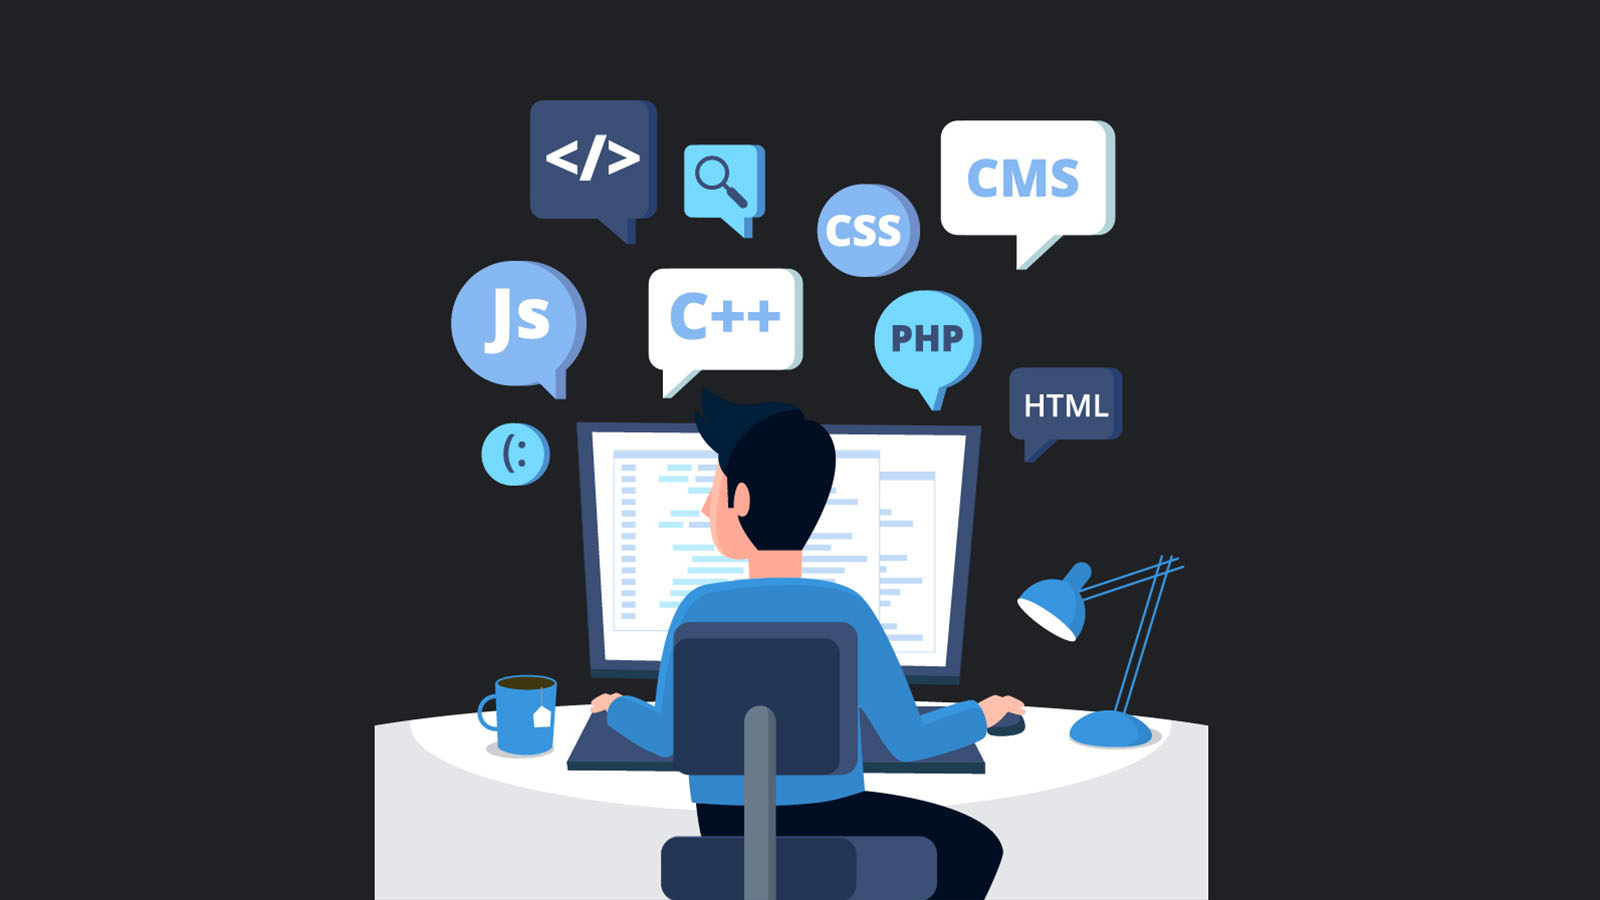 Ce este un software developer?